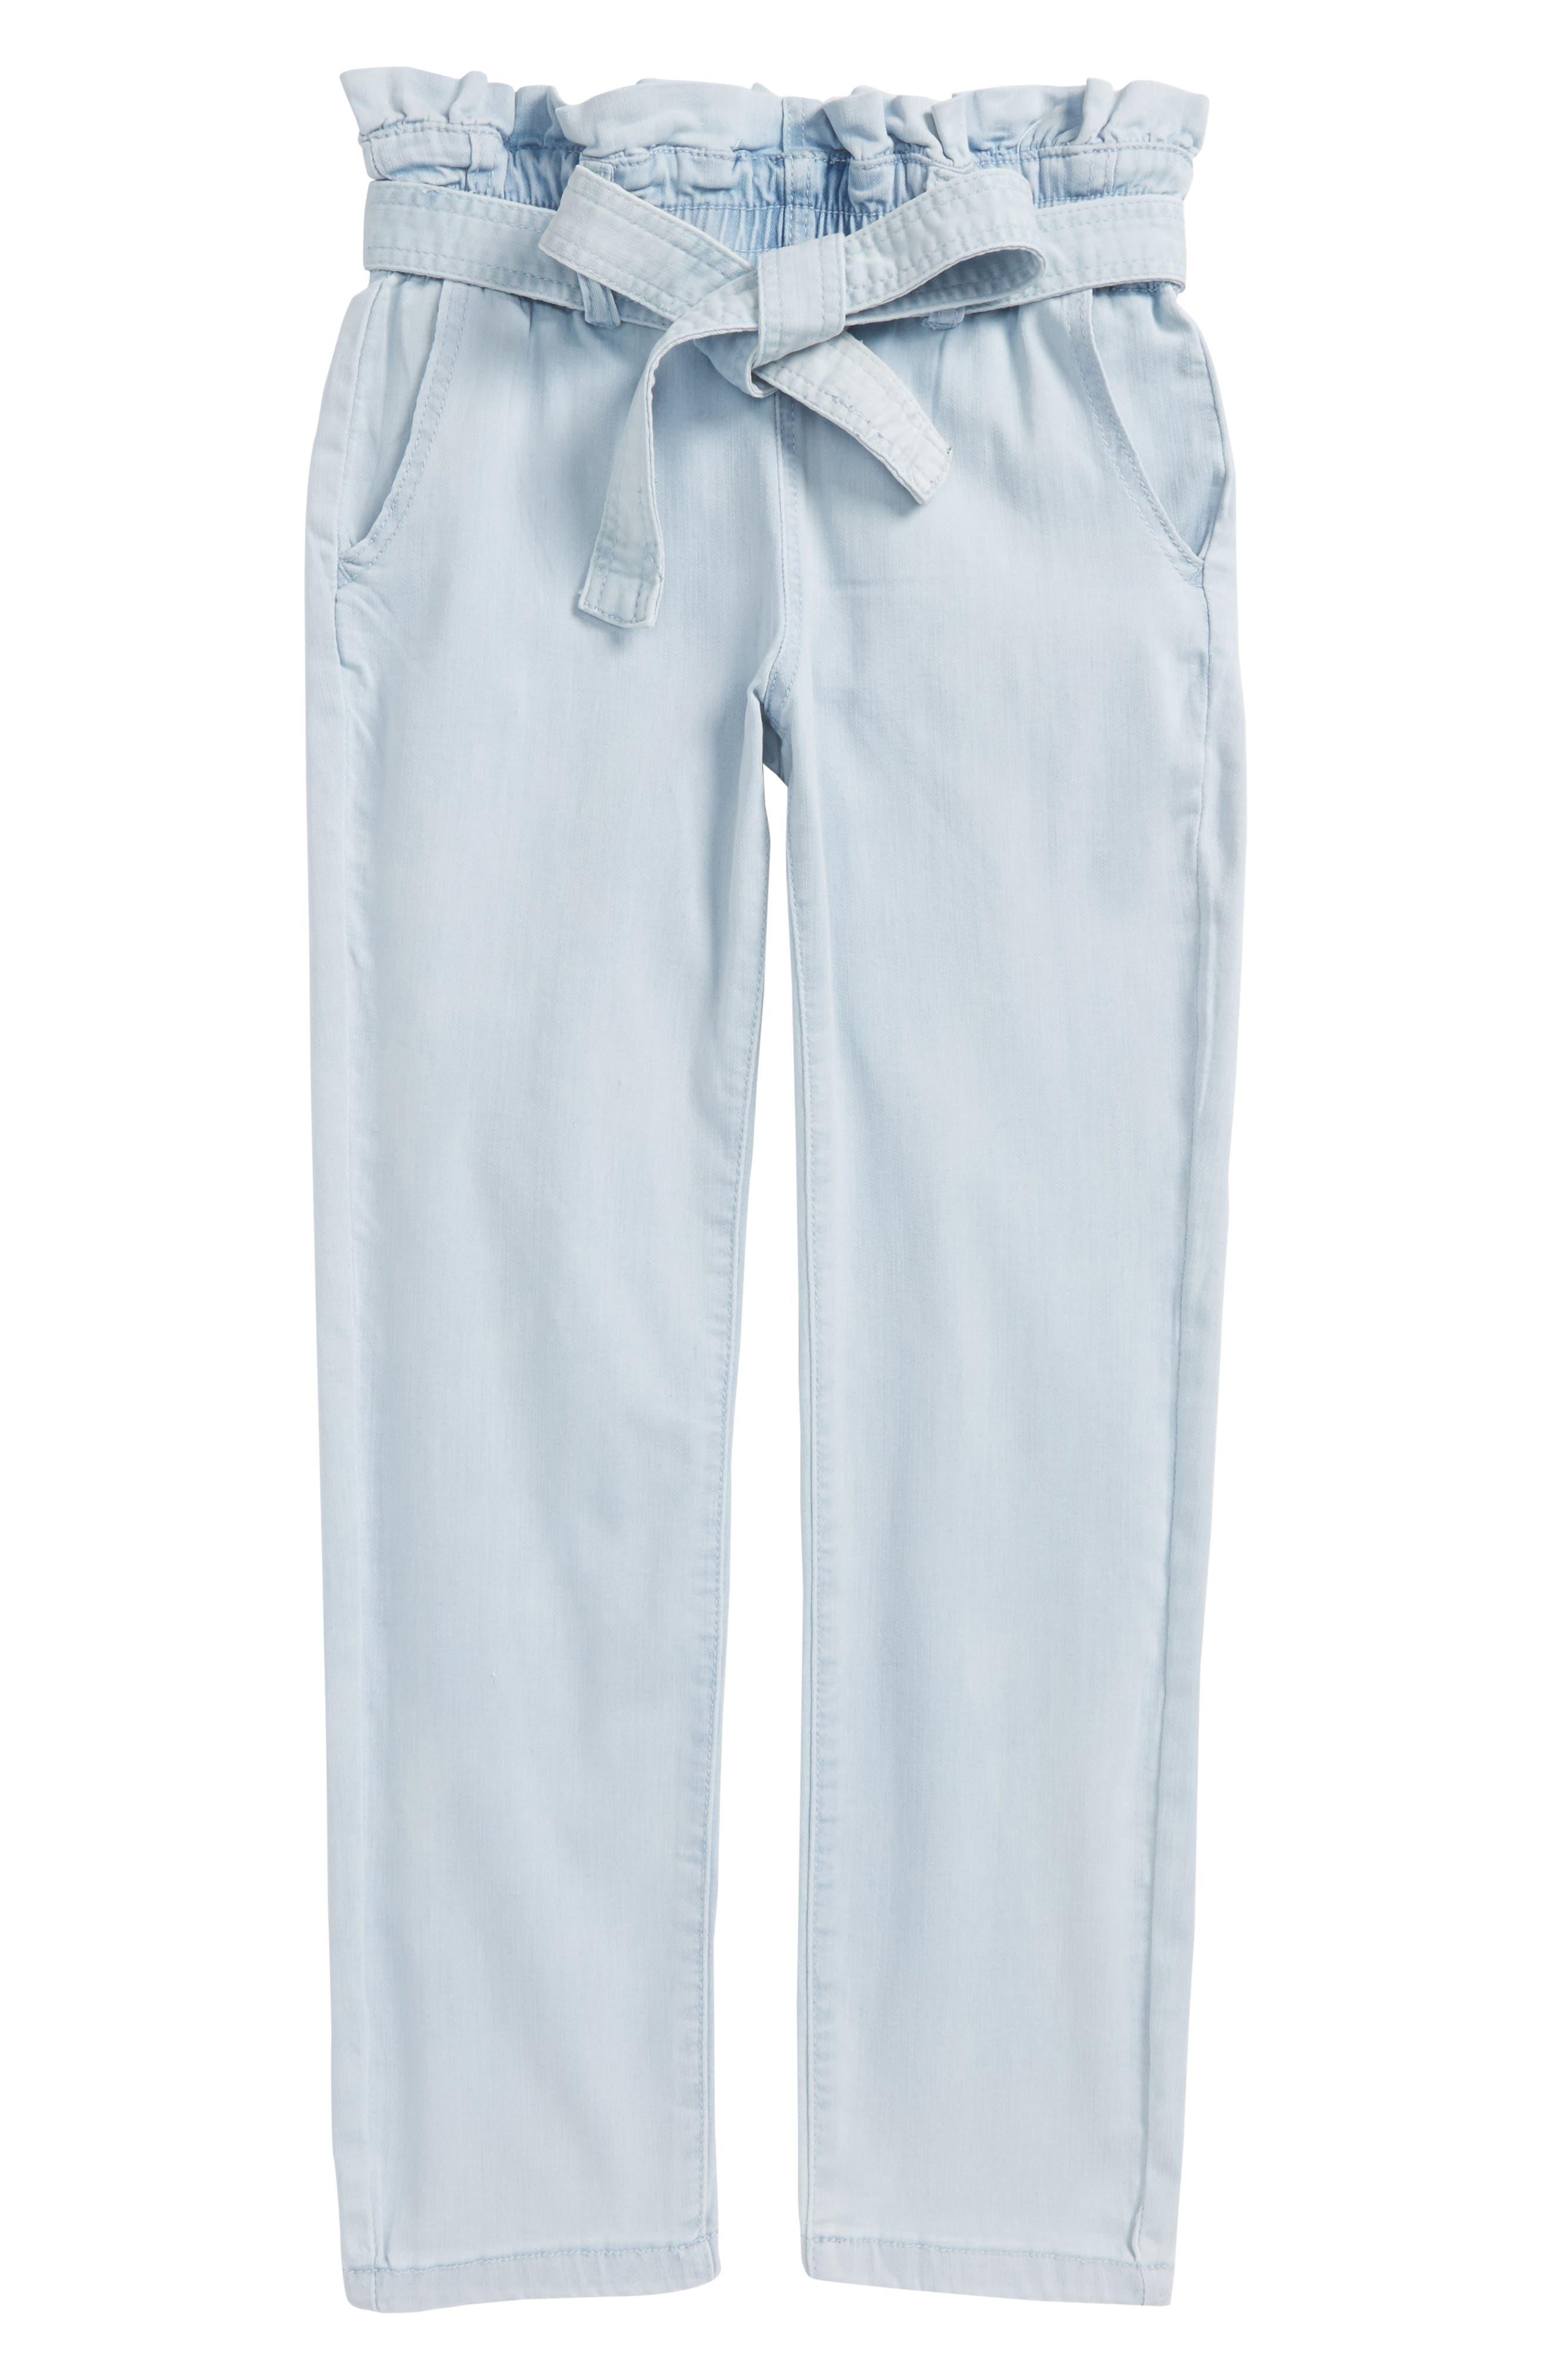 Paper Bag Crop Pants,                             Main thumbnail 1, color,                             404